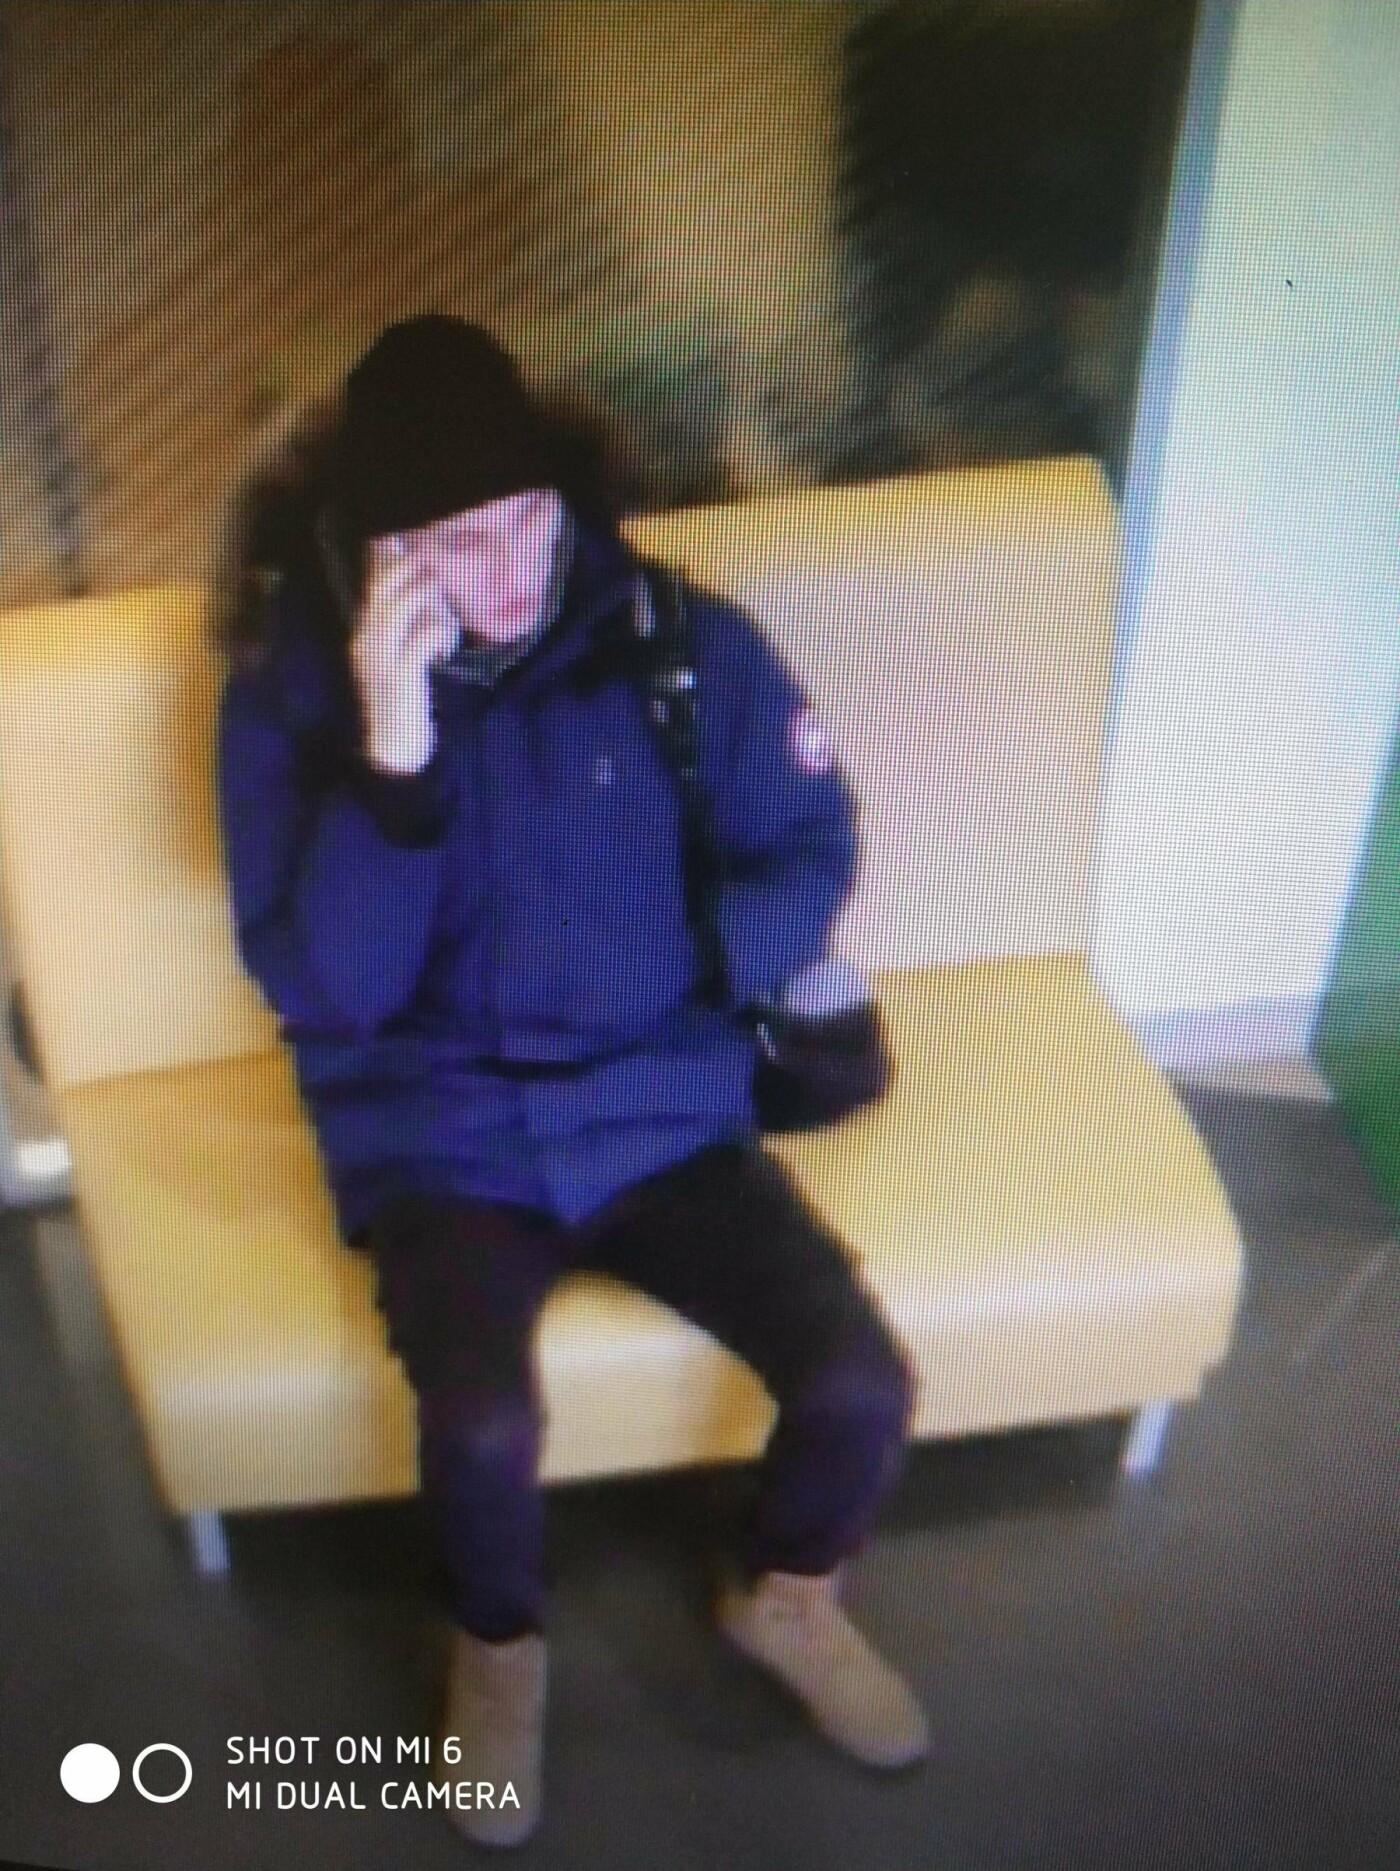 Подозреваемого в мошенничестве ищут в Петропавловске, фото-1